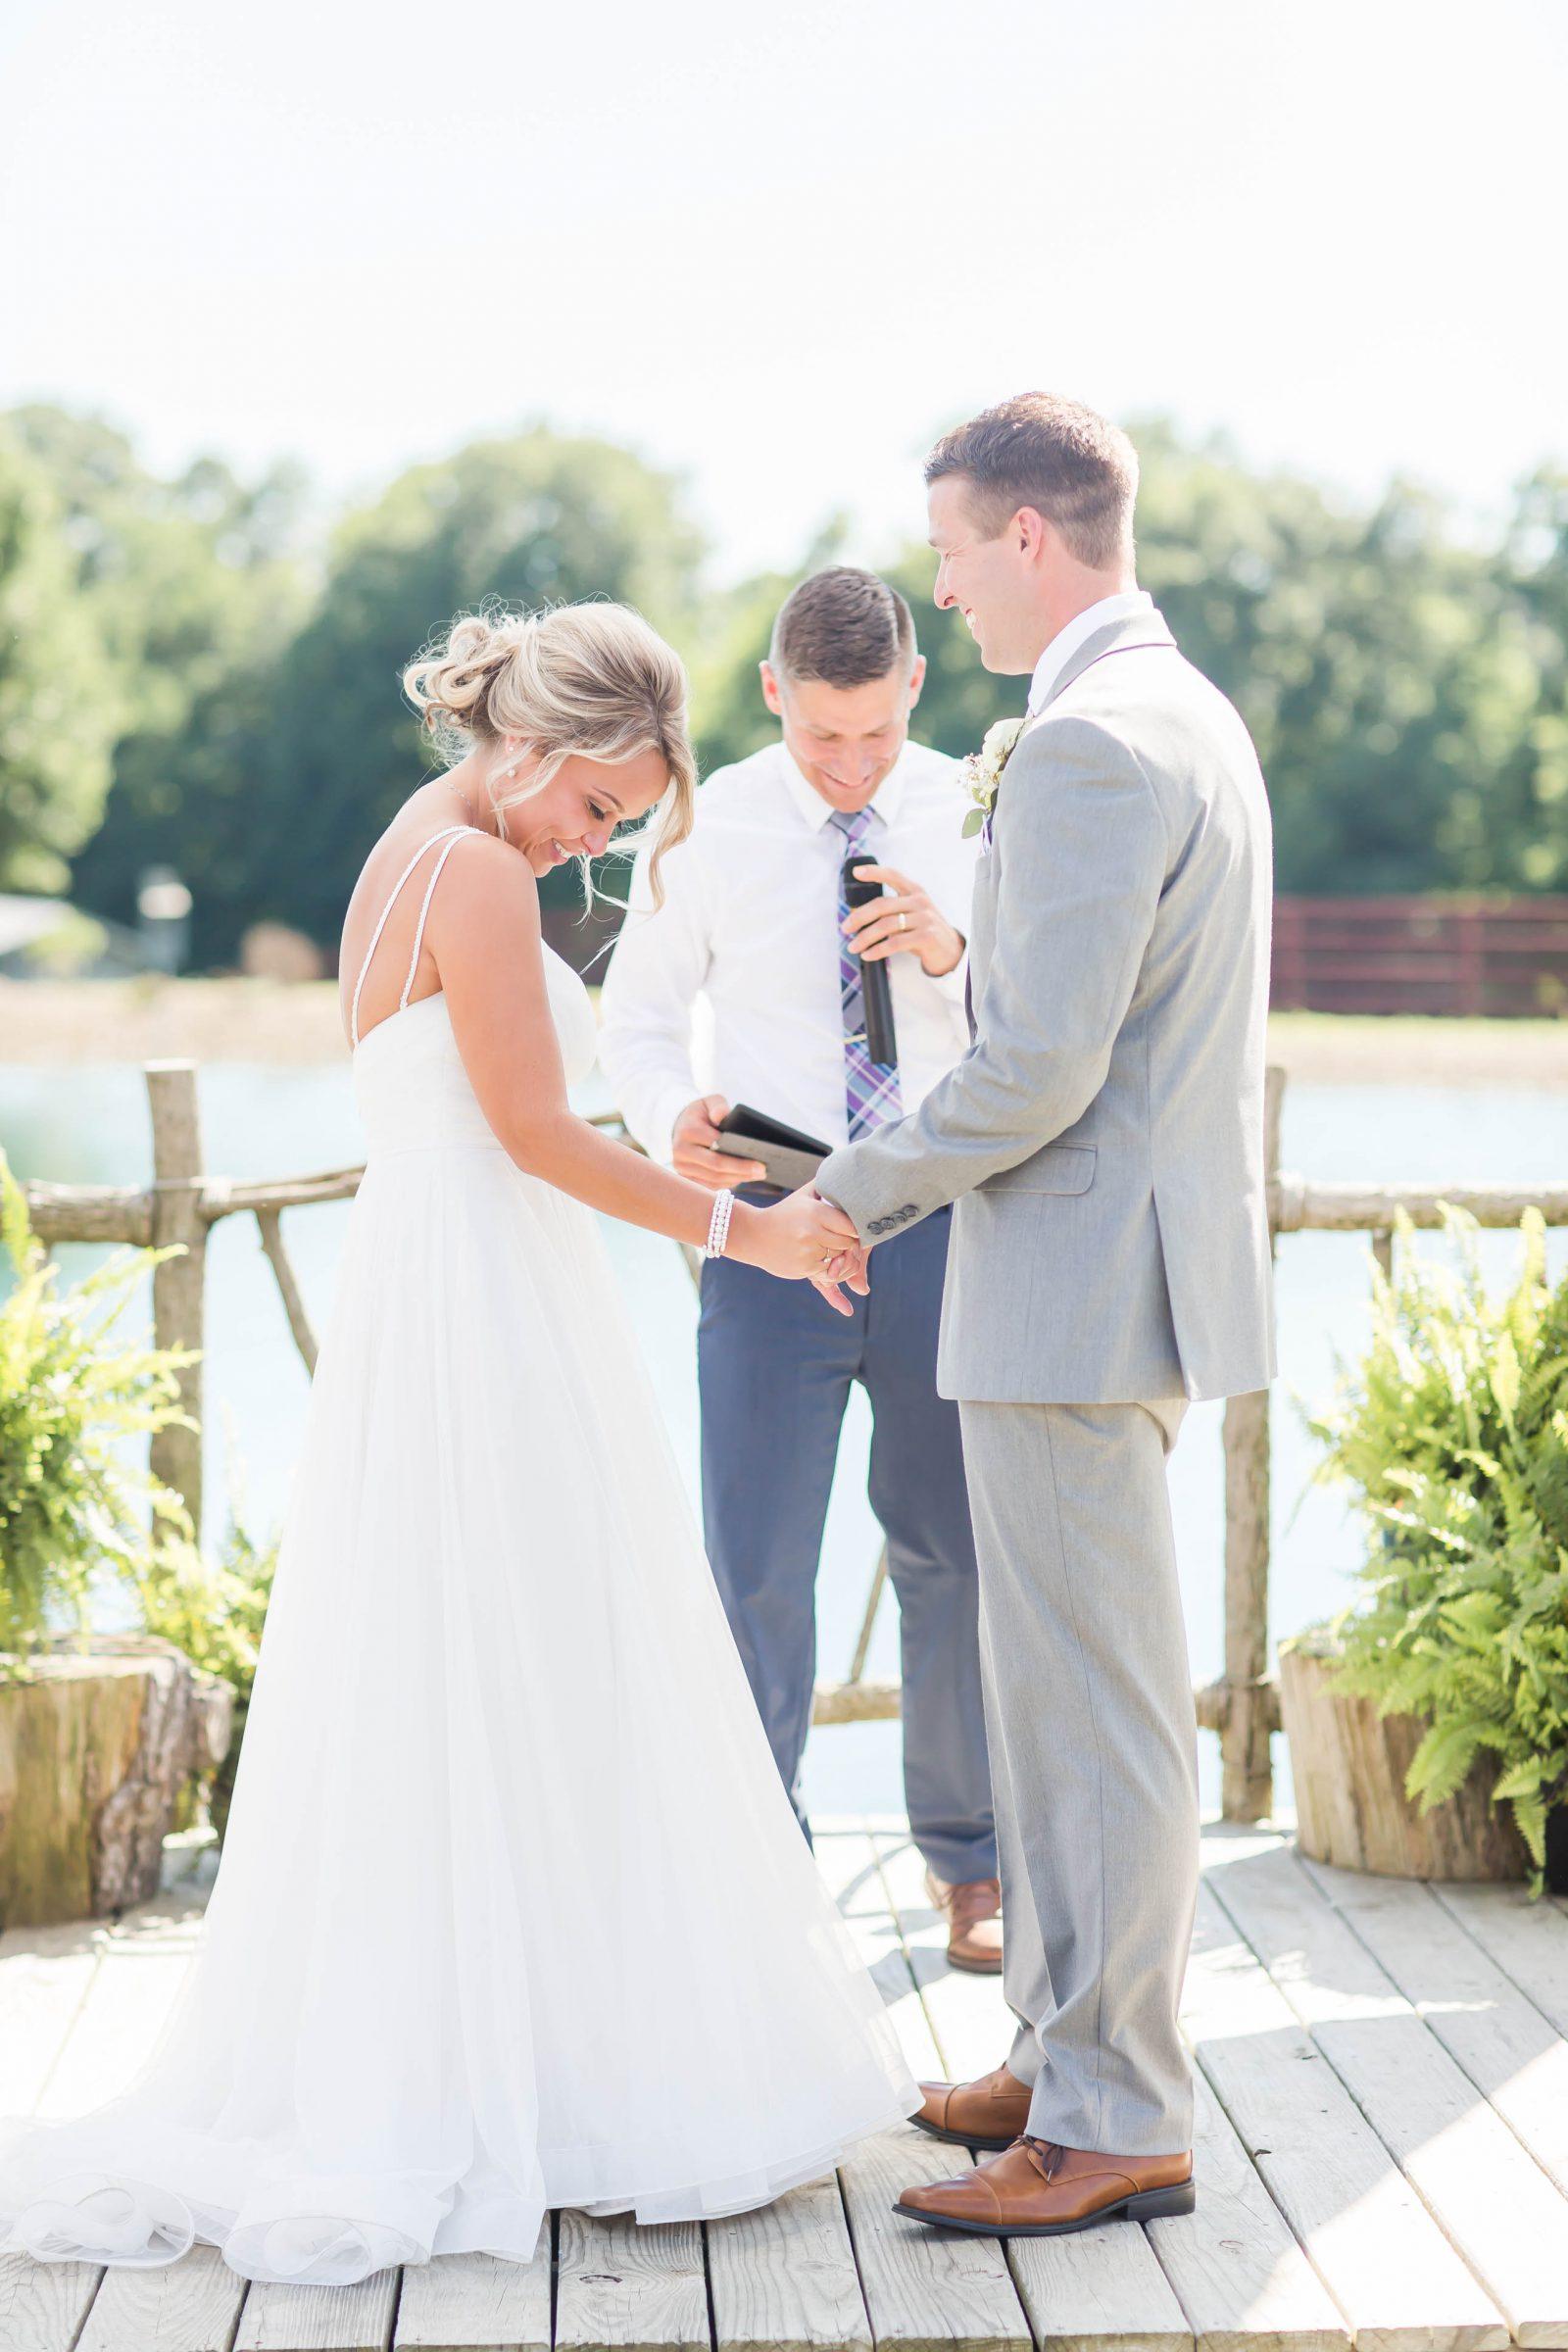 peacock-ridge-summer-wedding-photographer-akron-ohio-loren-jackson-photography-80